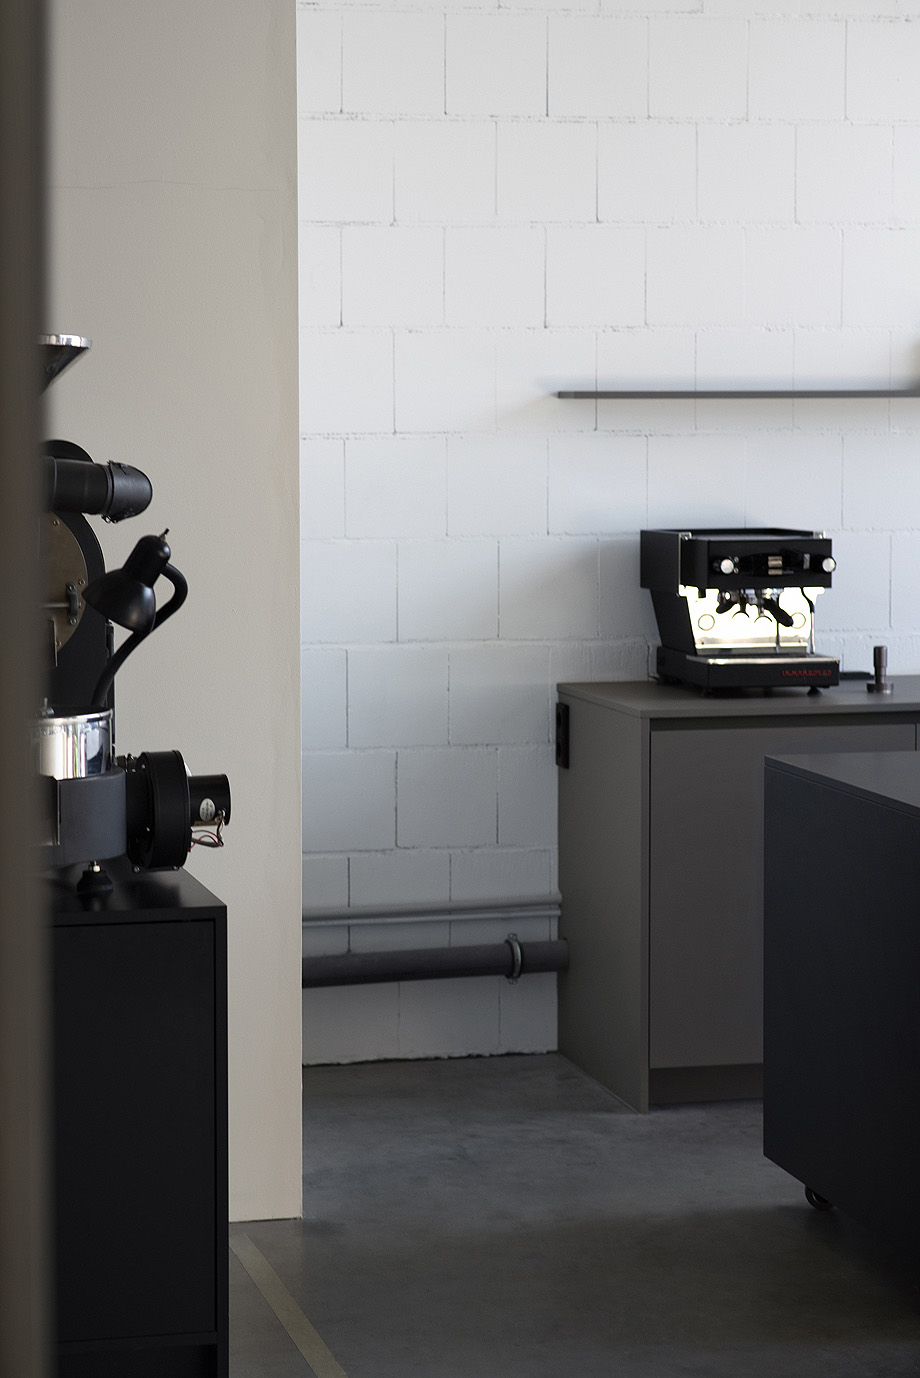 holm kaffee de gerdesmeyer krohn - foto gerdesmeyer krohn (7)